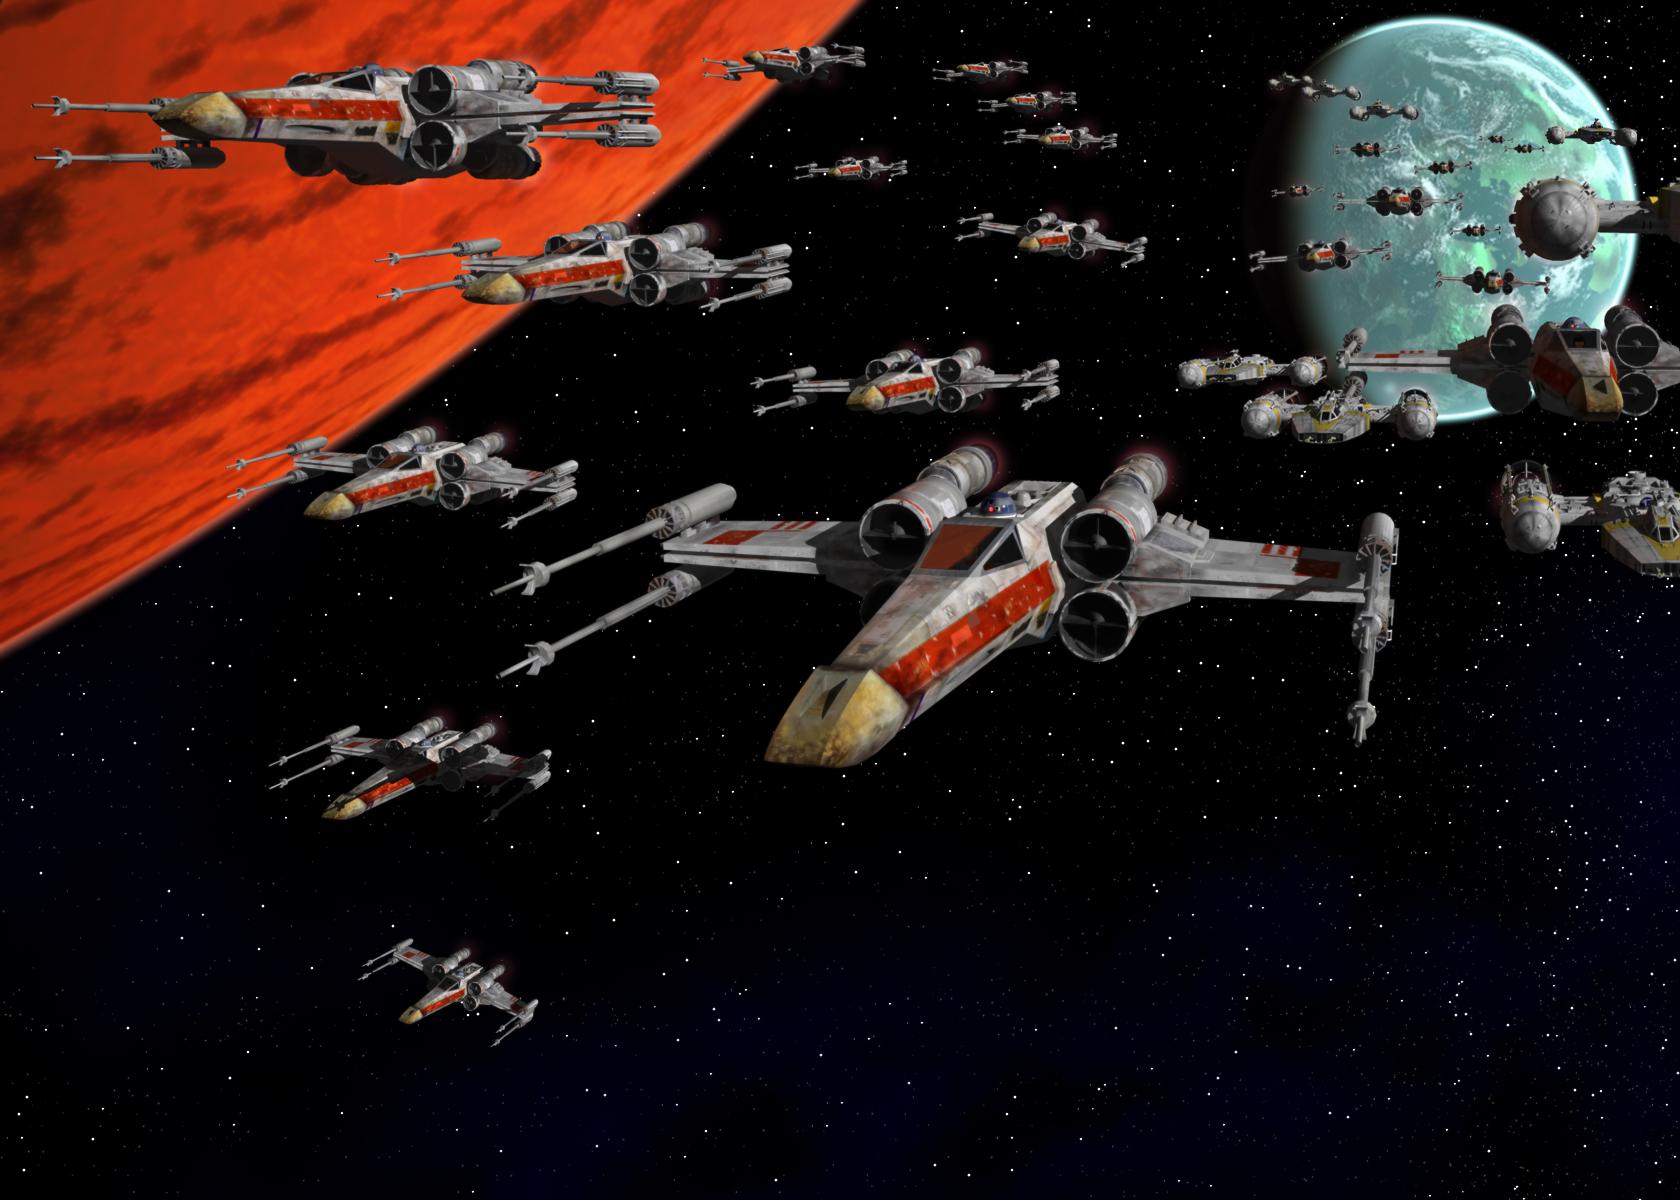 stars wars wallpaper Photo